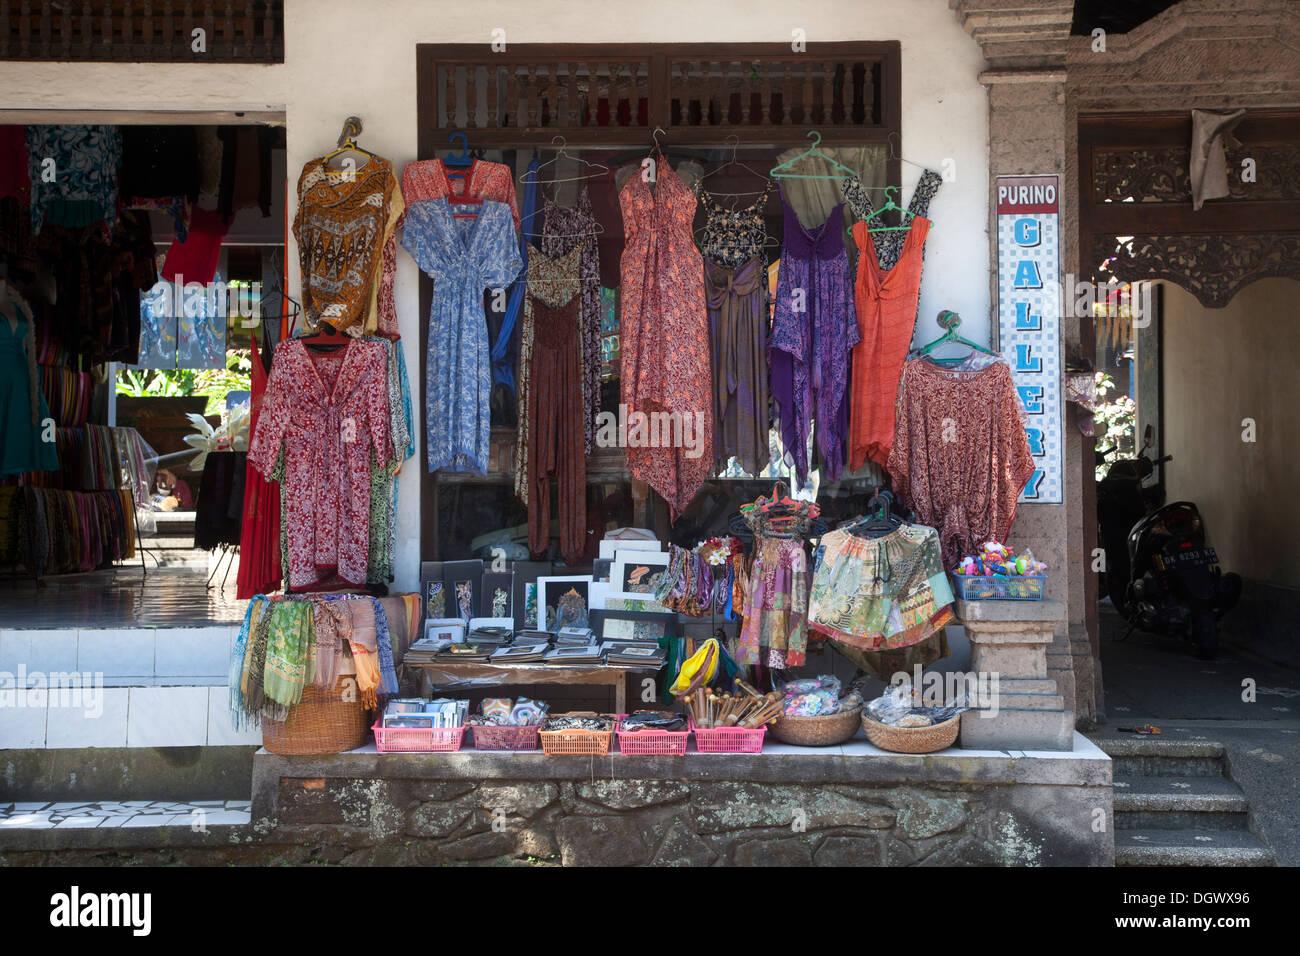 Fashion Shop Indonesia. 1, likes · 9 were here. fashion shop.